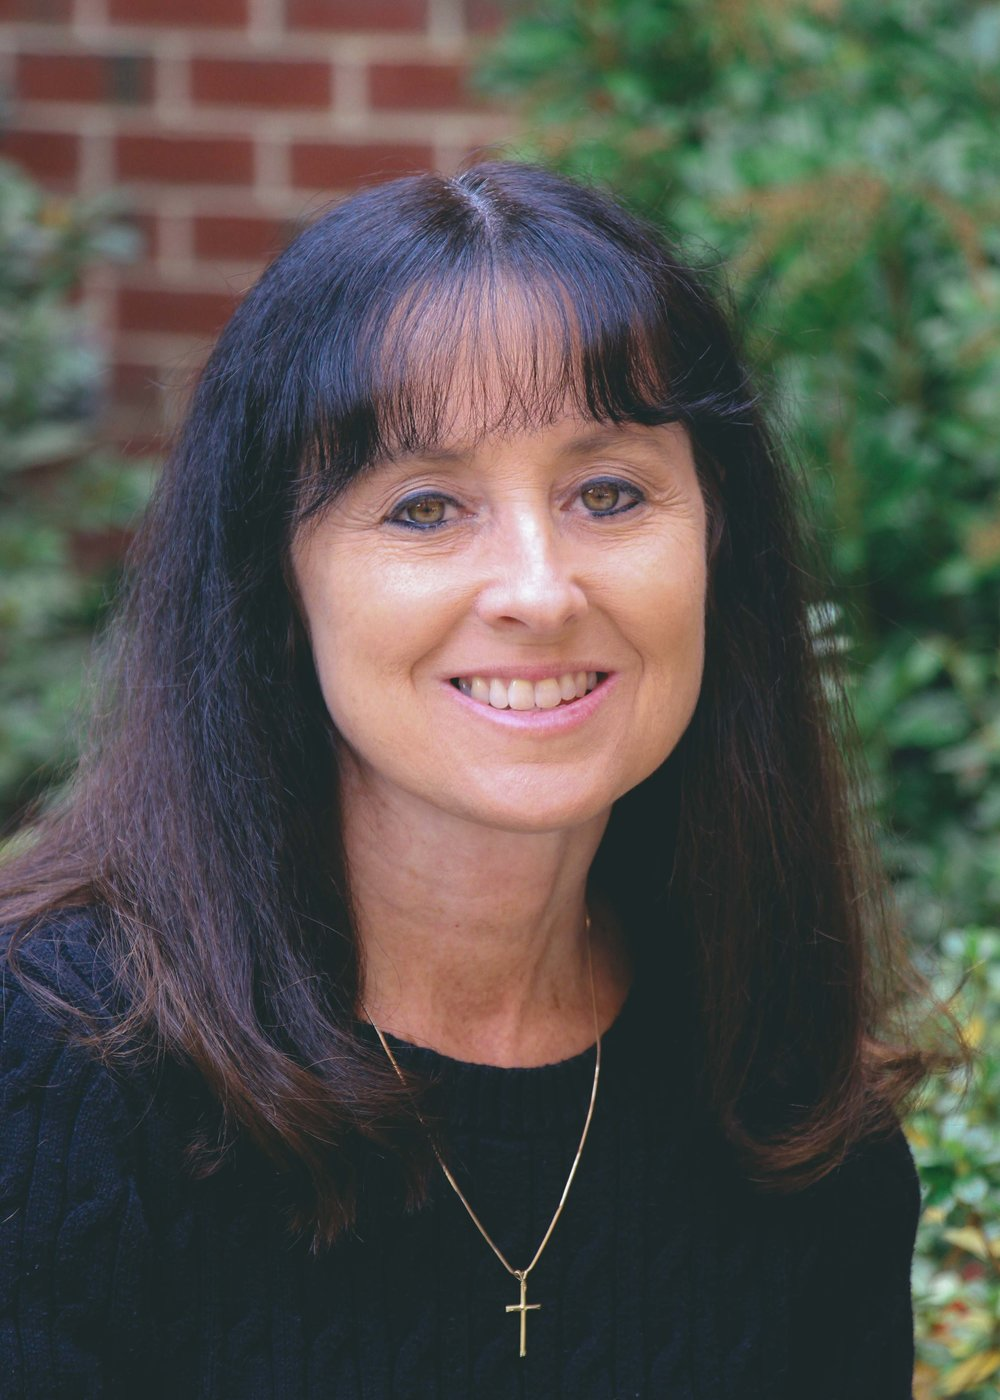 LISA BARTON / Receptionist - lbarton@bonsackbaptist.org